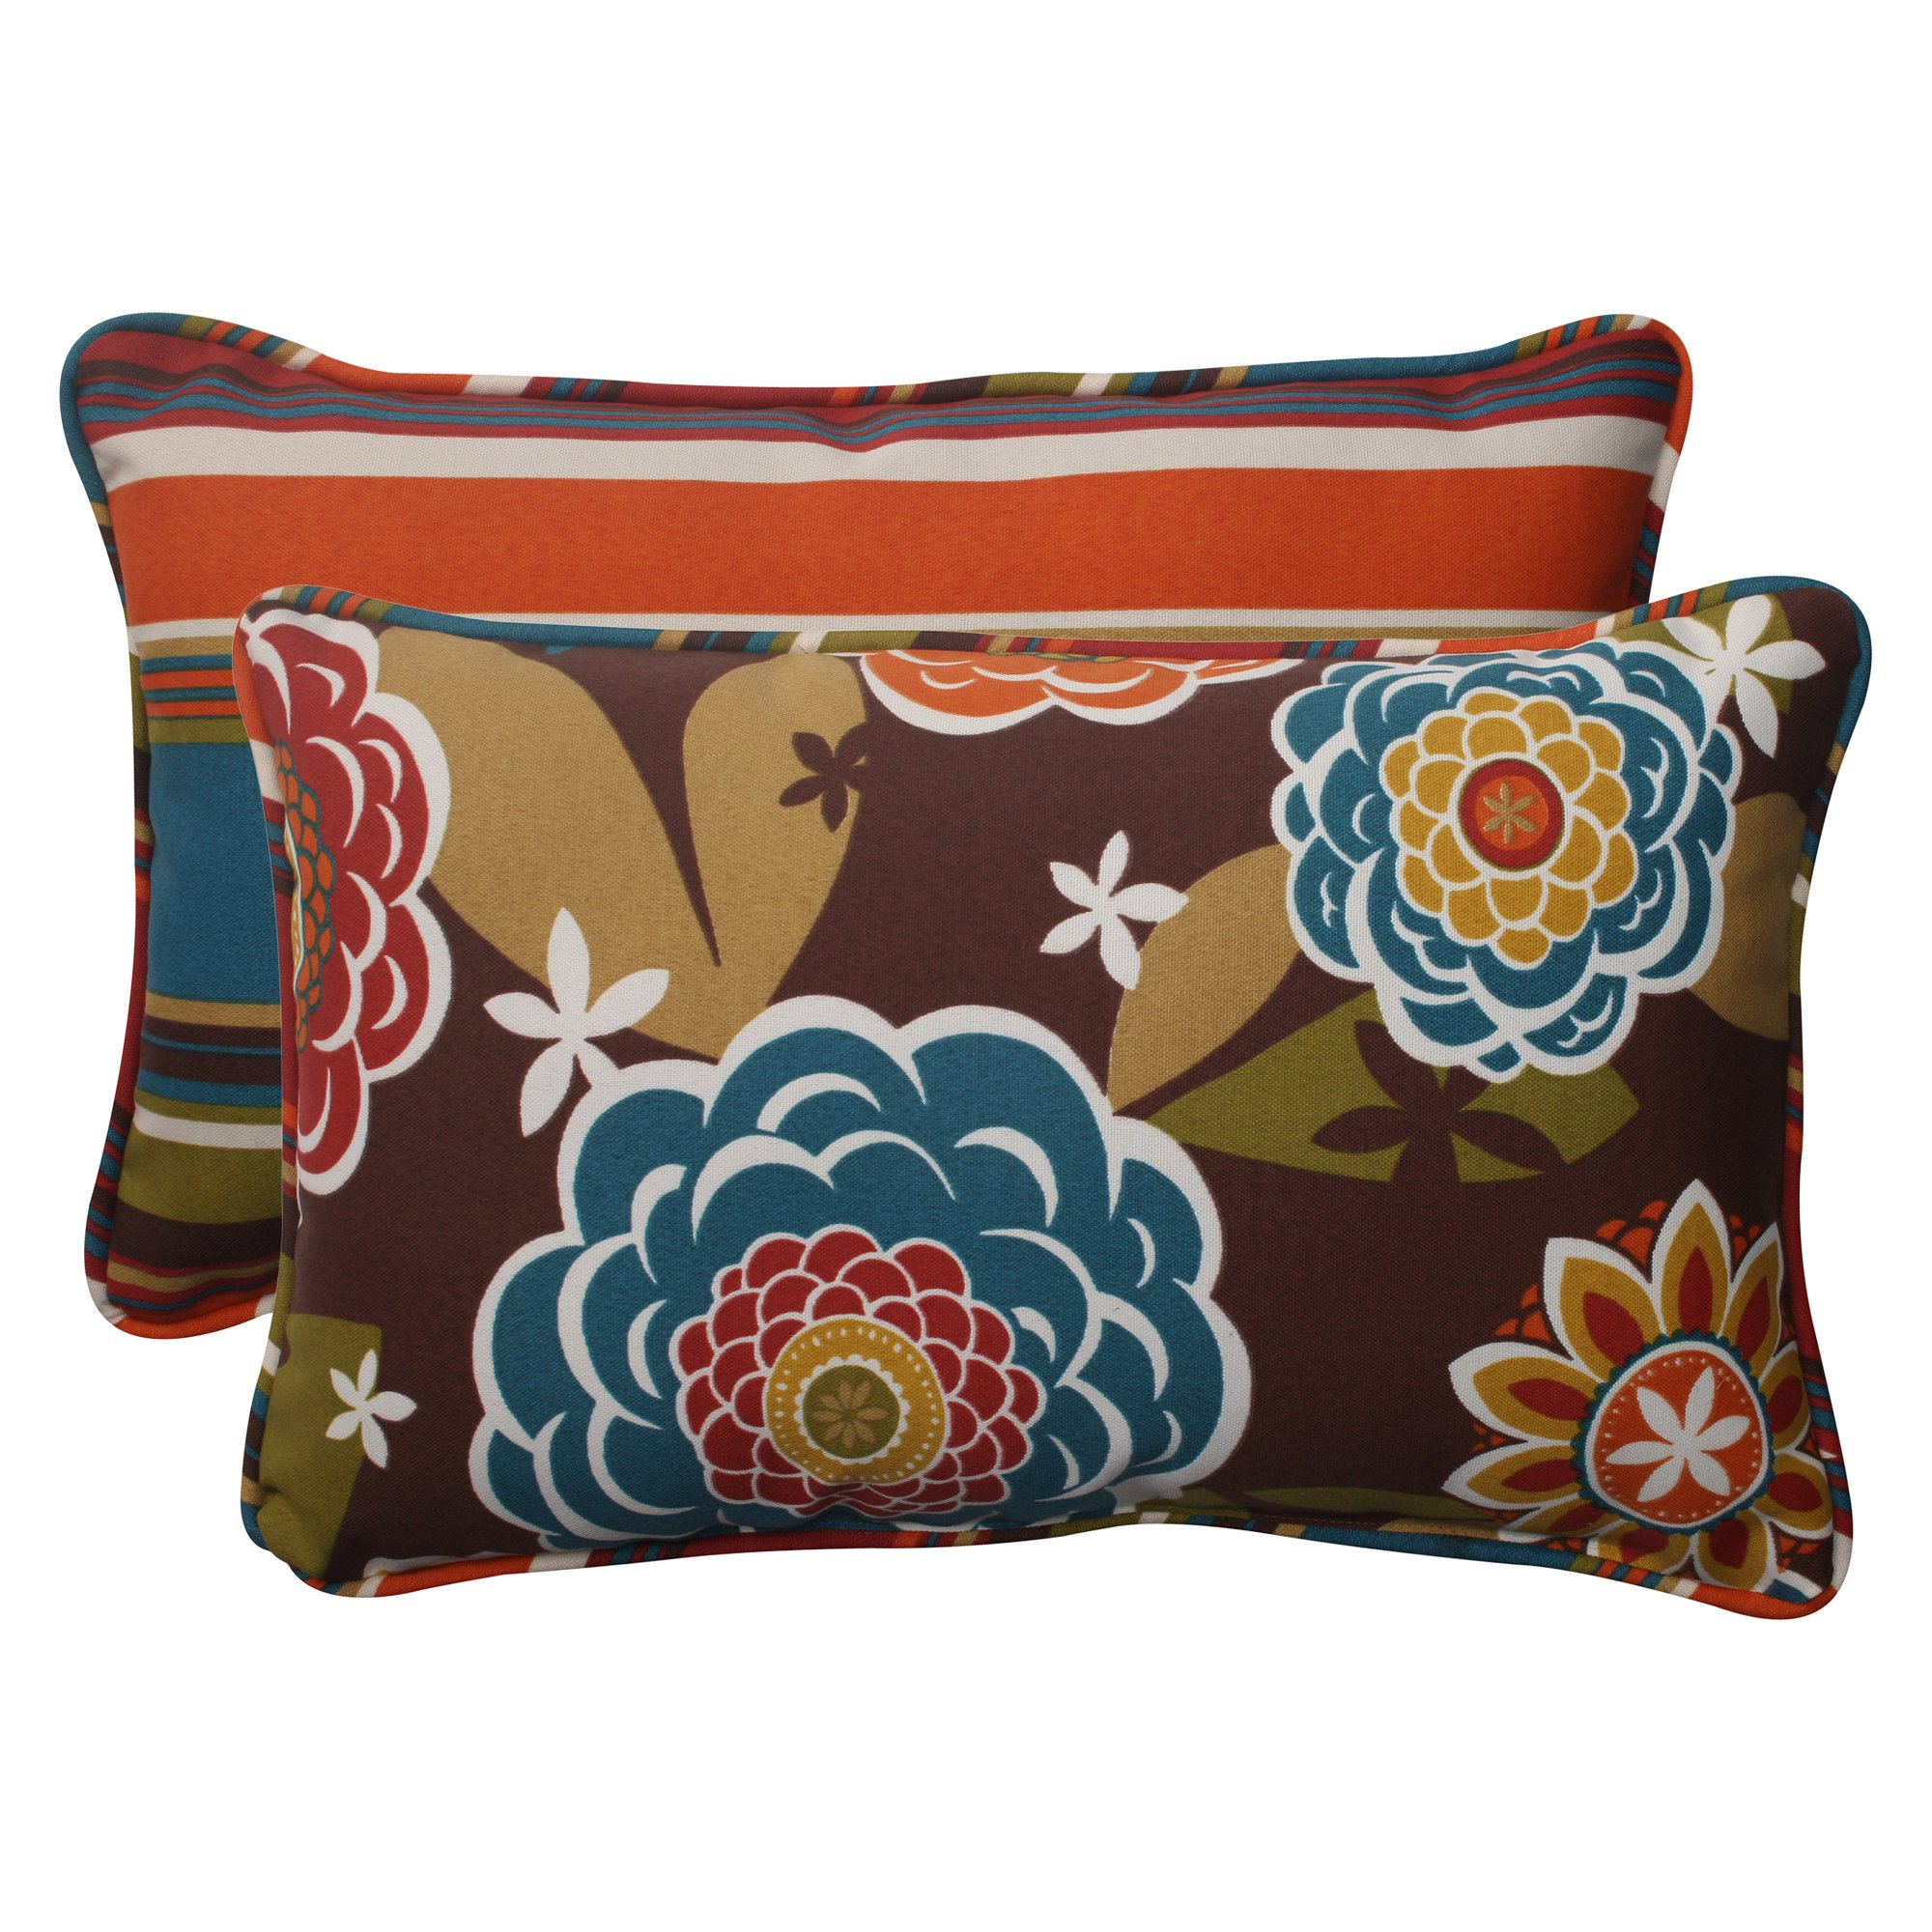 Pillow Perfect Indoor/Outdoor Annie Westport Reversible Corded Rectangular Throw Pillow, Chocolate, Set of 2